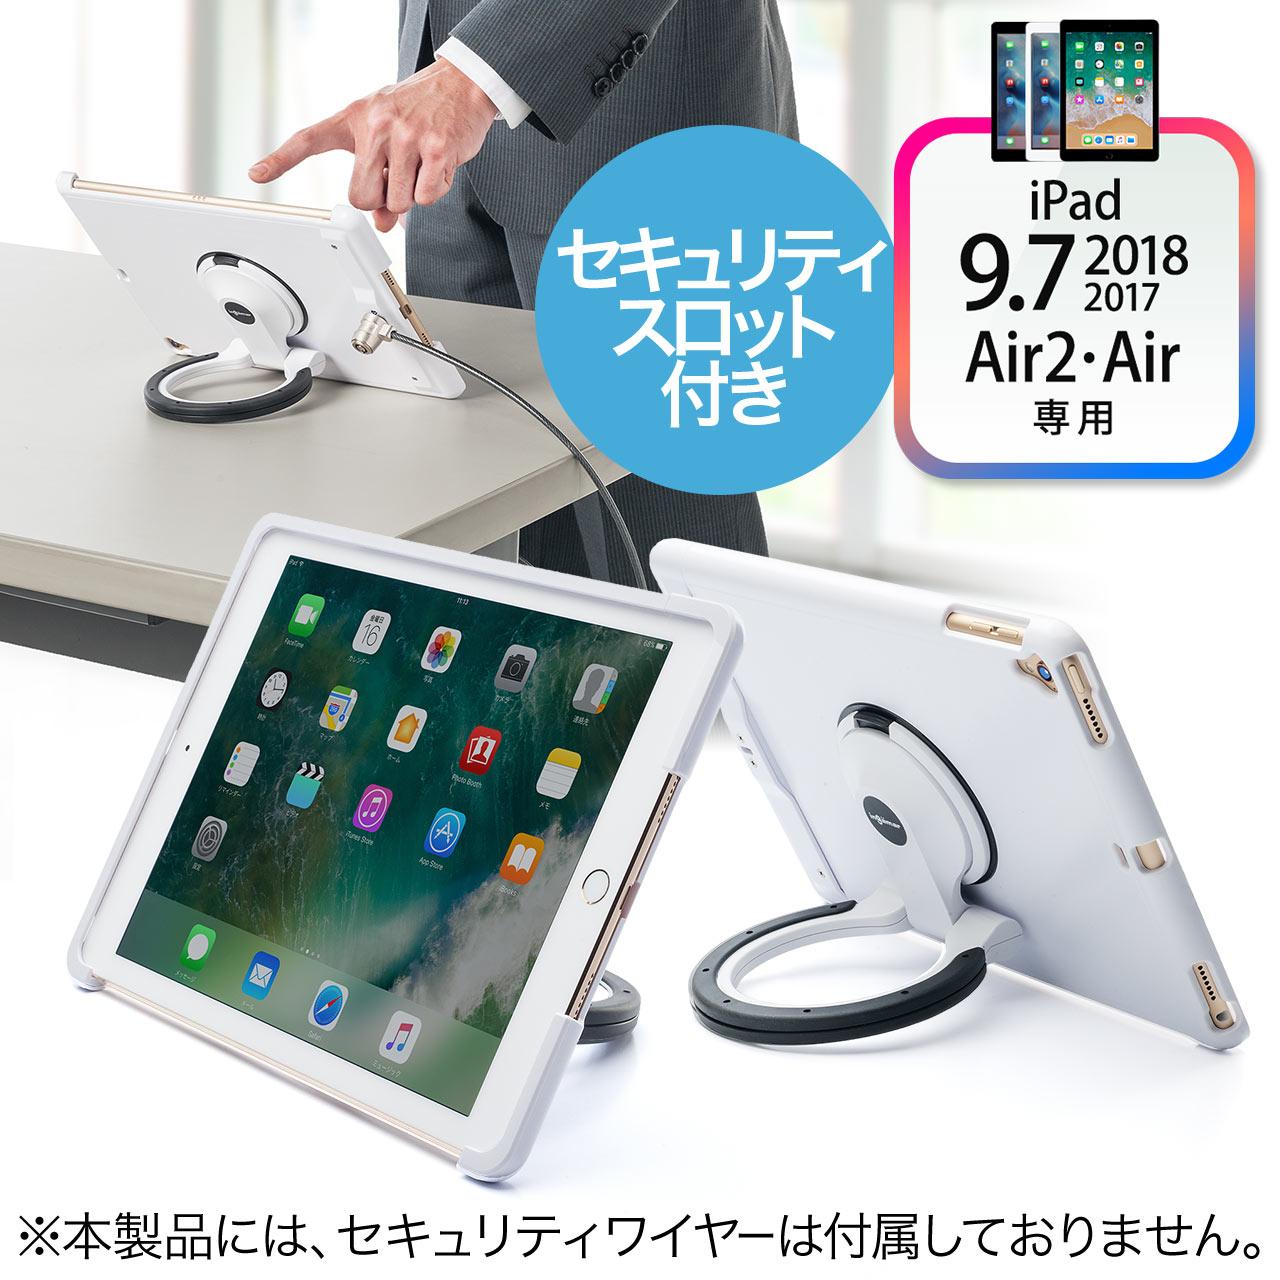 iPadセキュリティースタンド サンワダイレクト サンワサプライ 200-SL043W